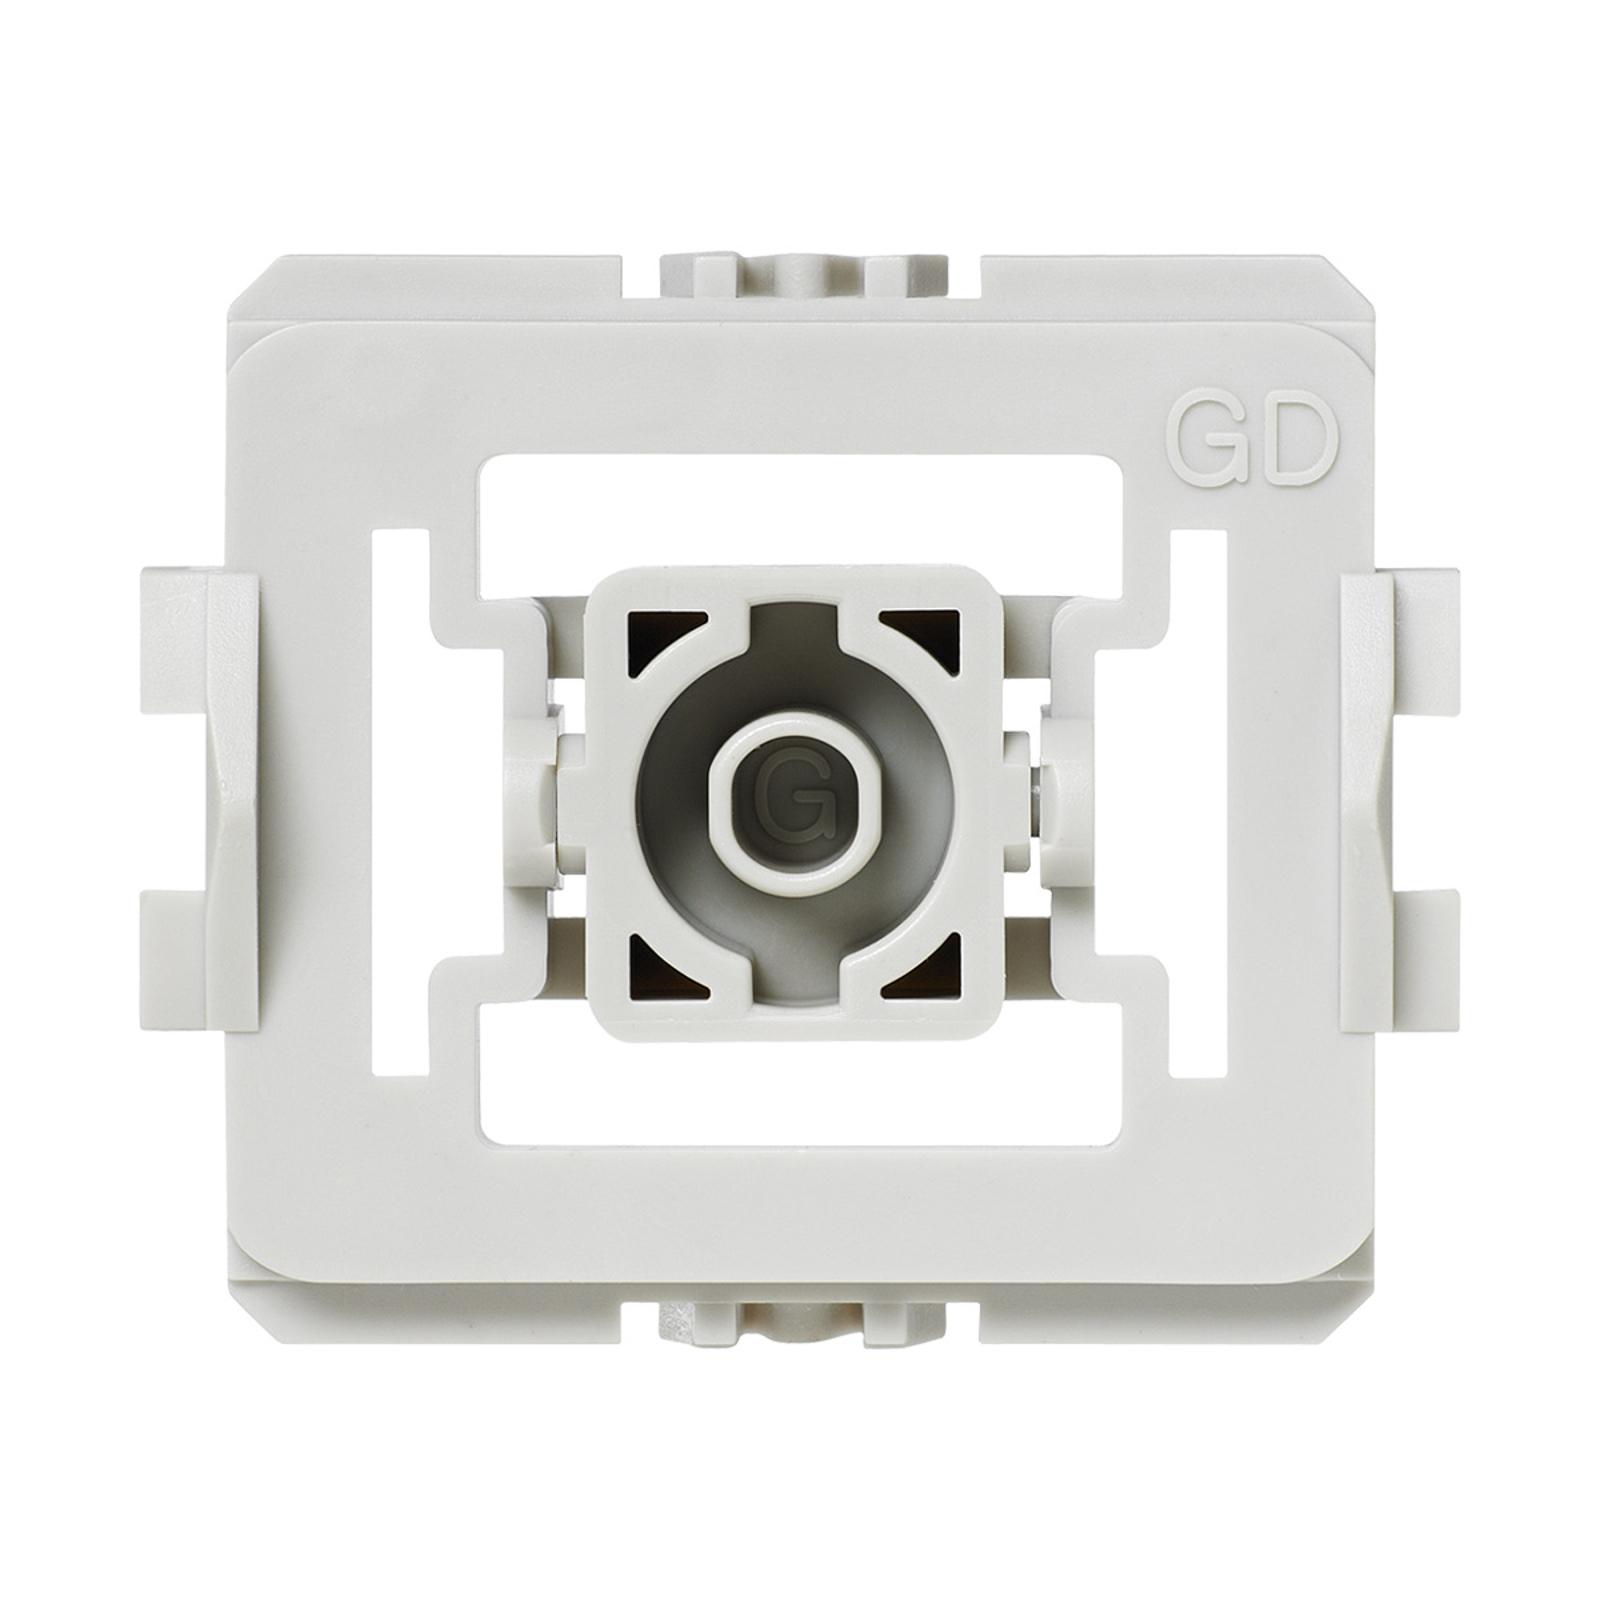 Homematic IP-adapter for Gira bryterstandard 1x